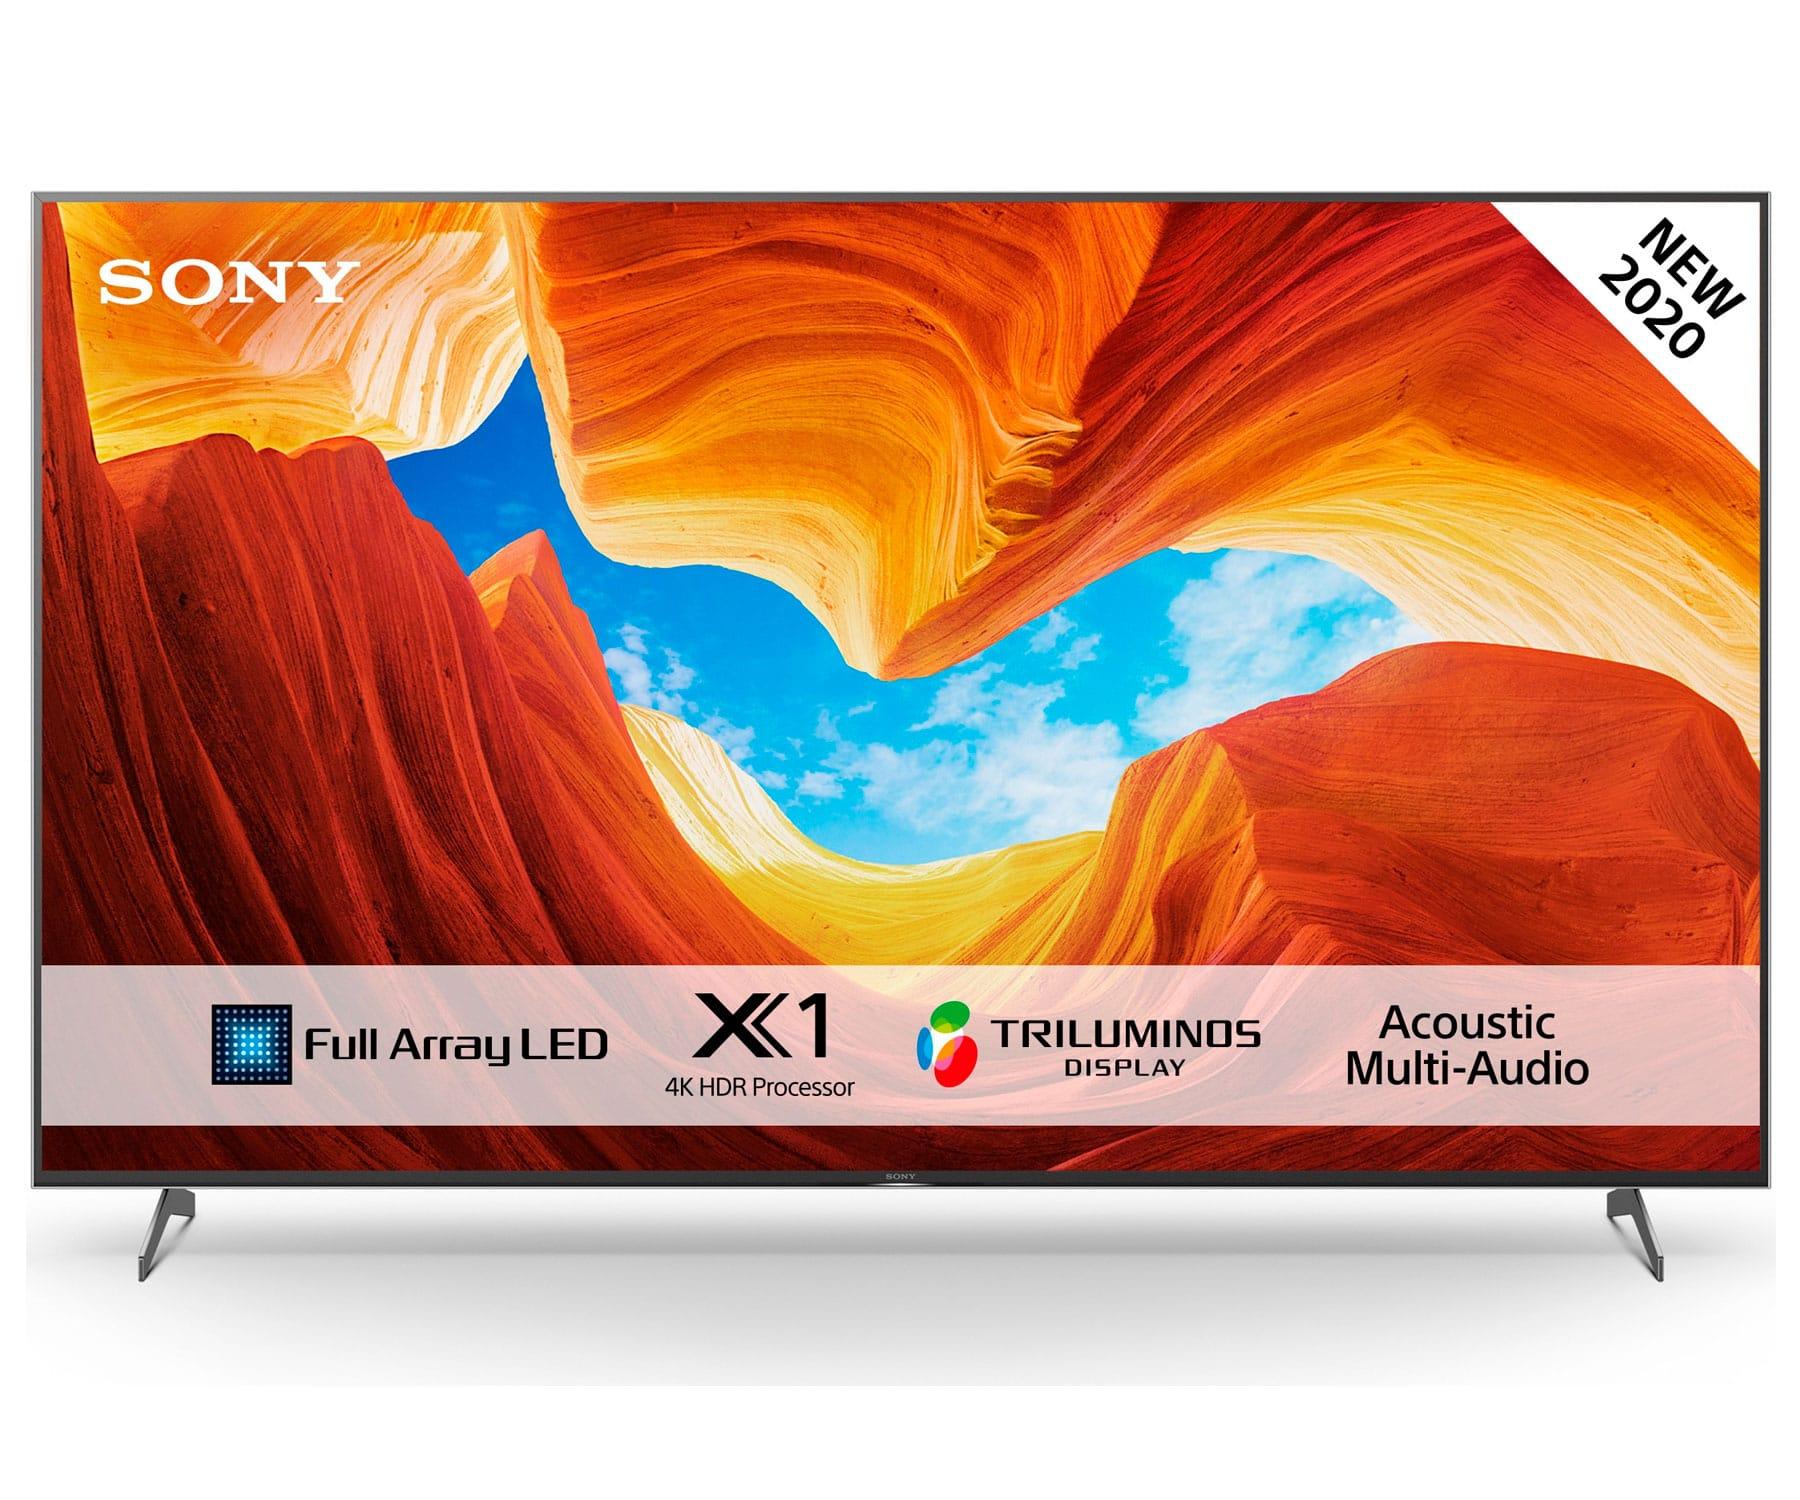 SONY KE-75XH9096 TELEVISOR 75'' FULL ARRAY LED UHD 4K HDR ANDROID TV